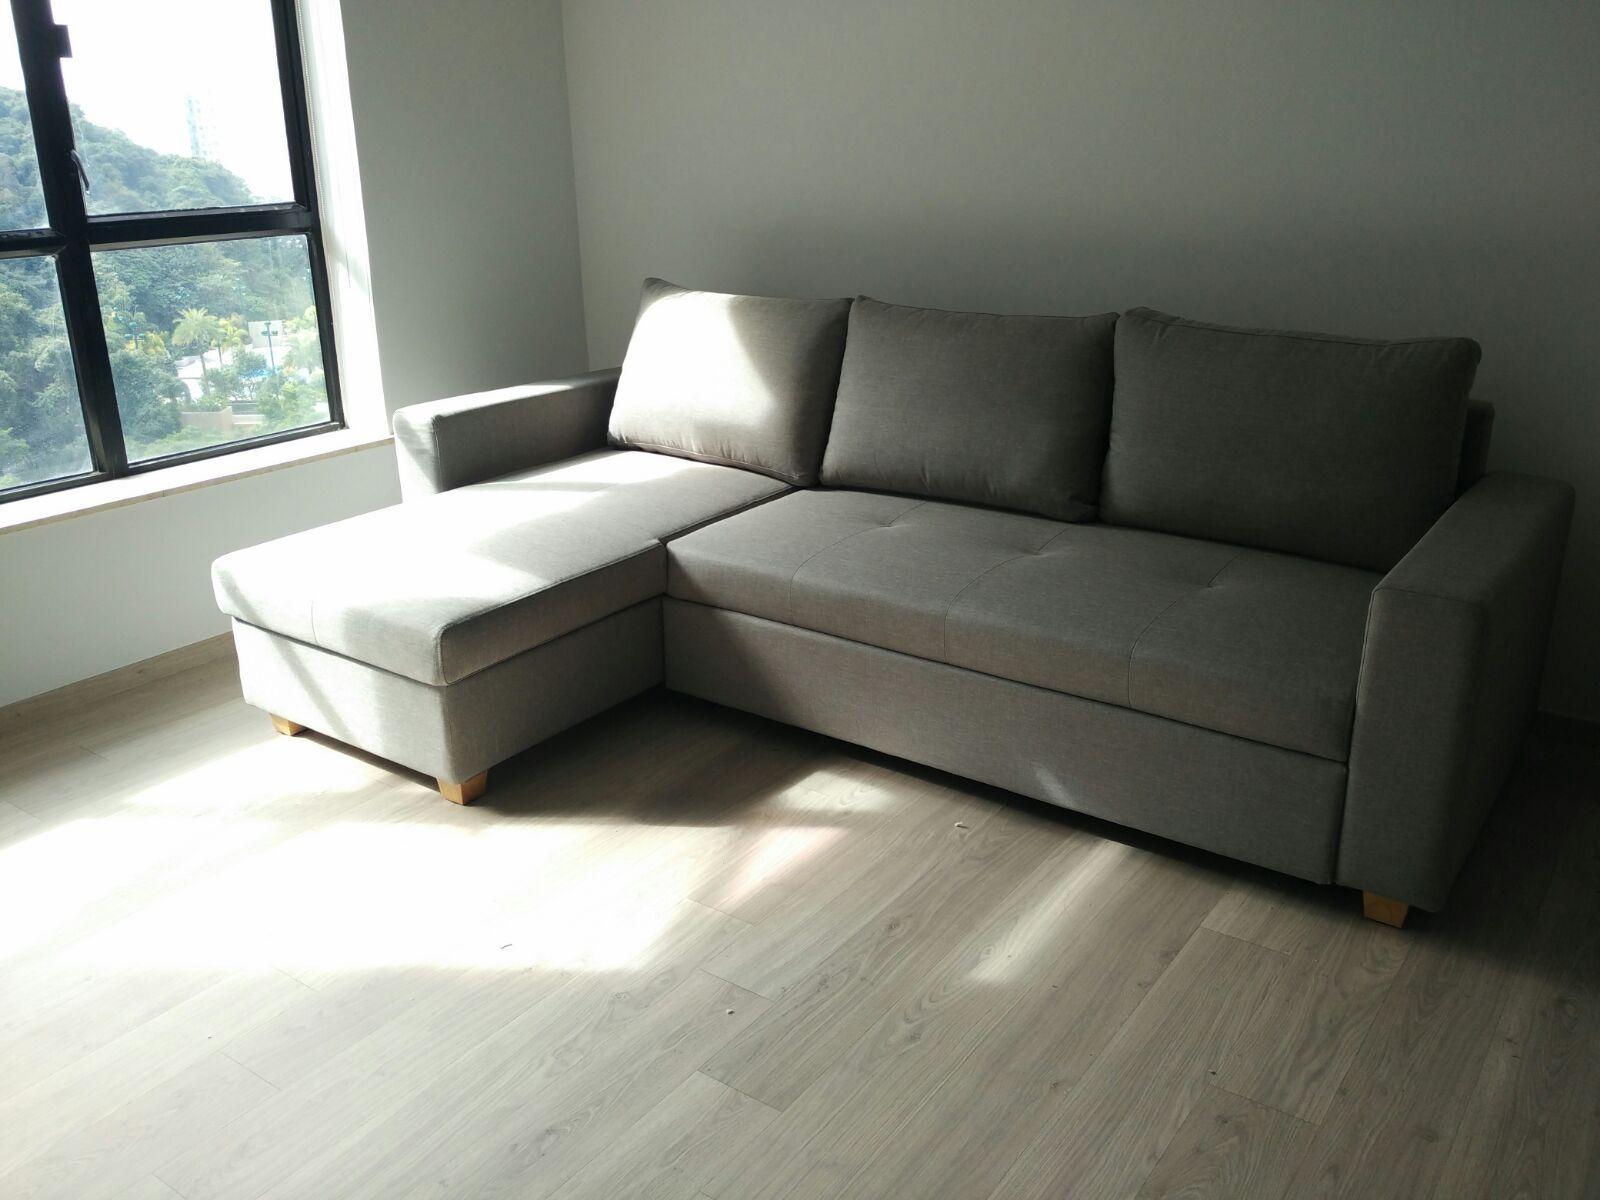 Christian sofabed modern sofa bed pinterest christian